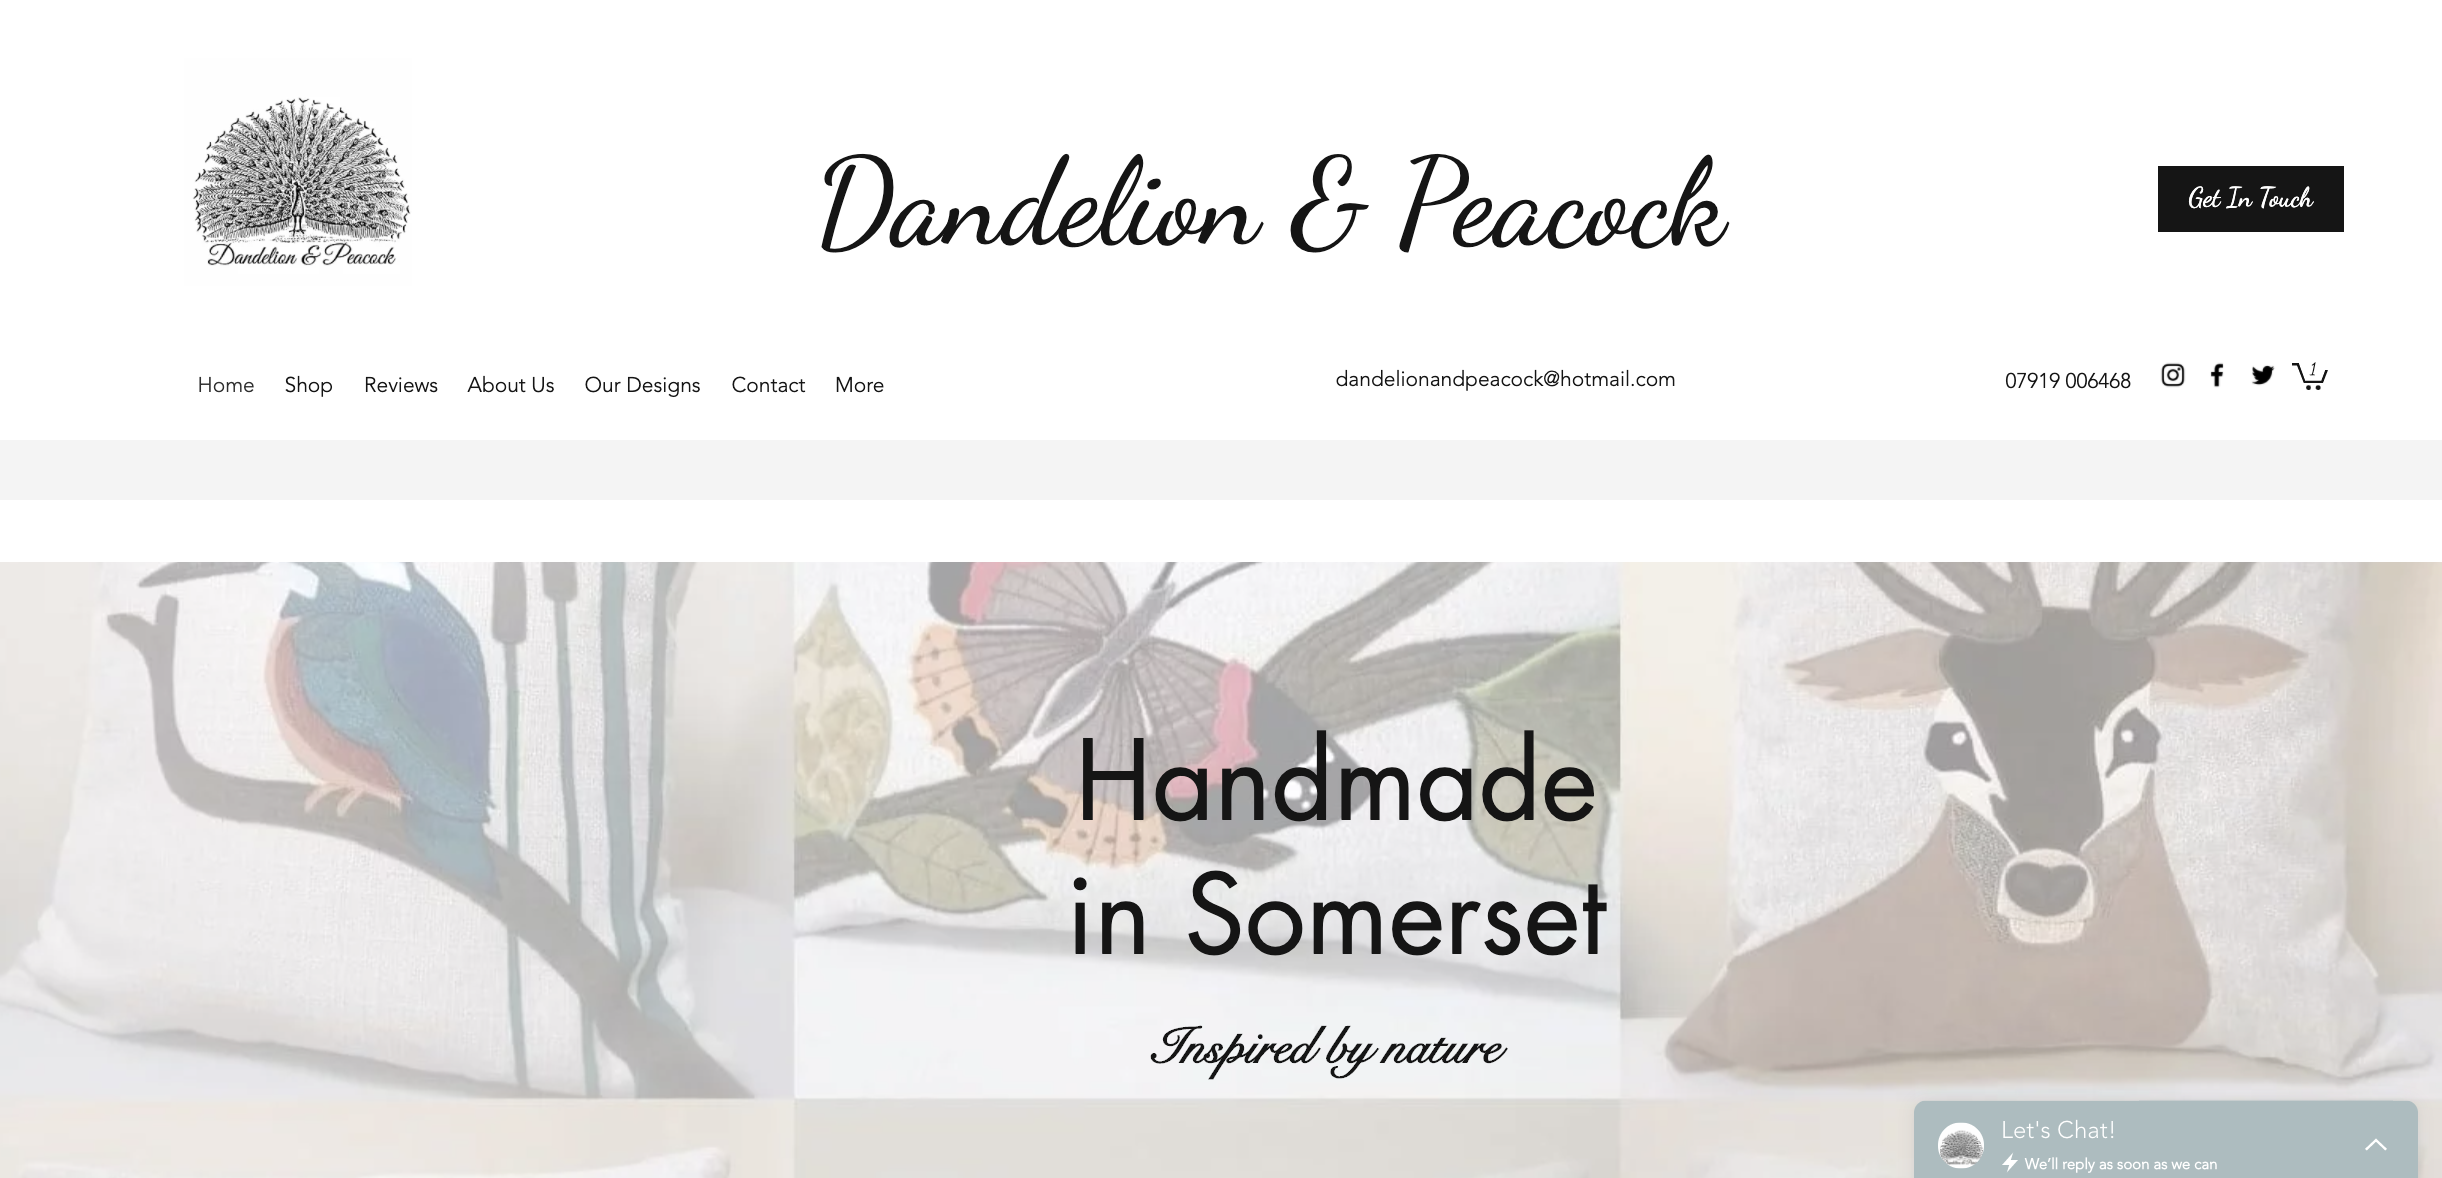 Dandelion & Peacock